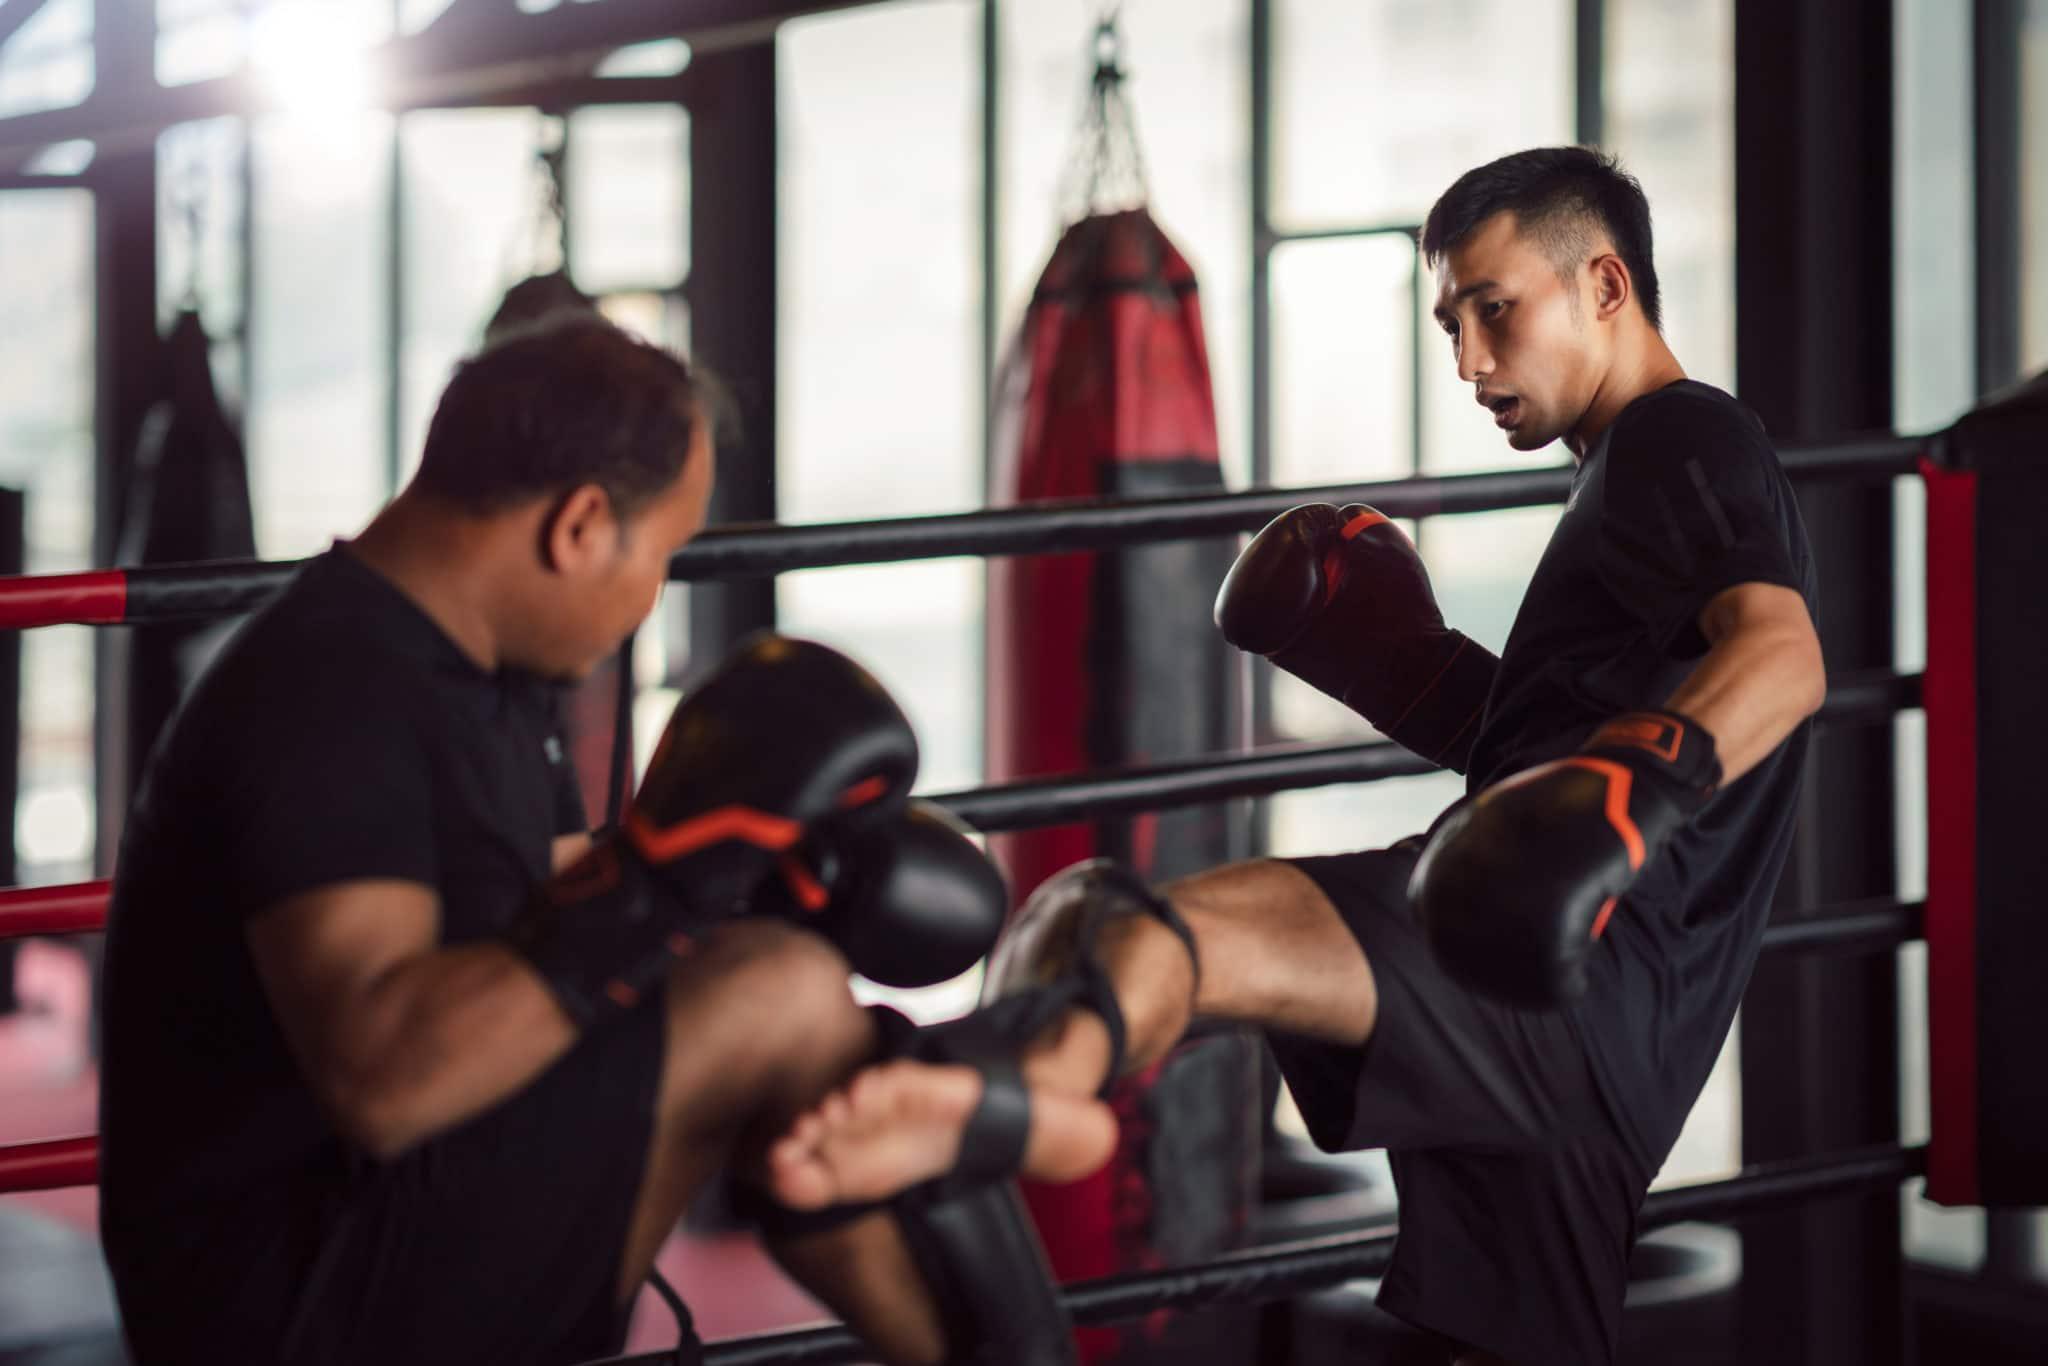 muay thai training, health and fitness